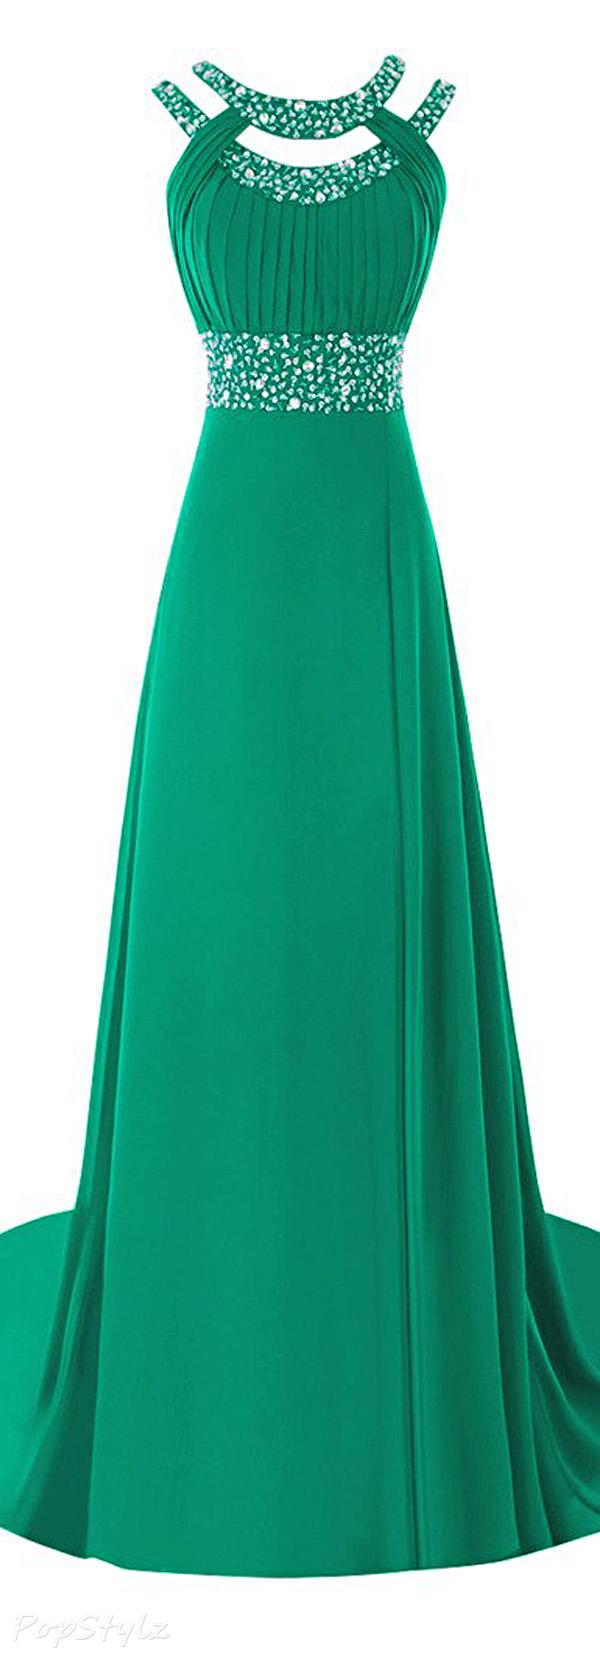 Ellames Scoop Neck Crystals Evening Gown